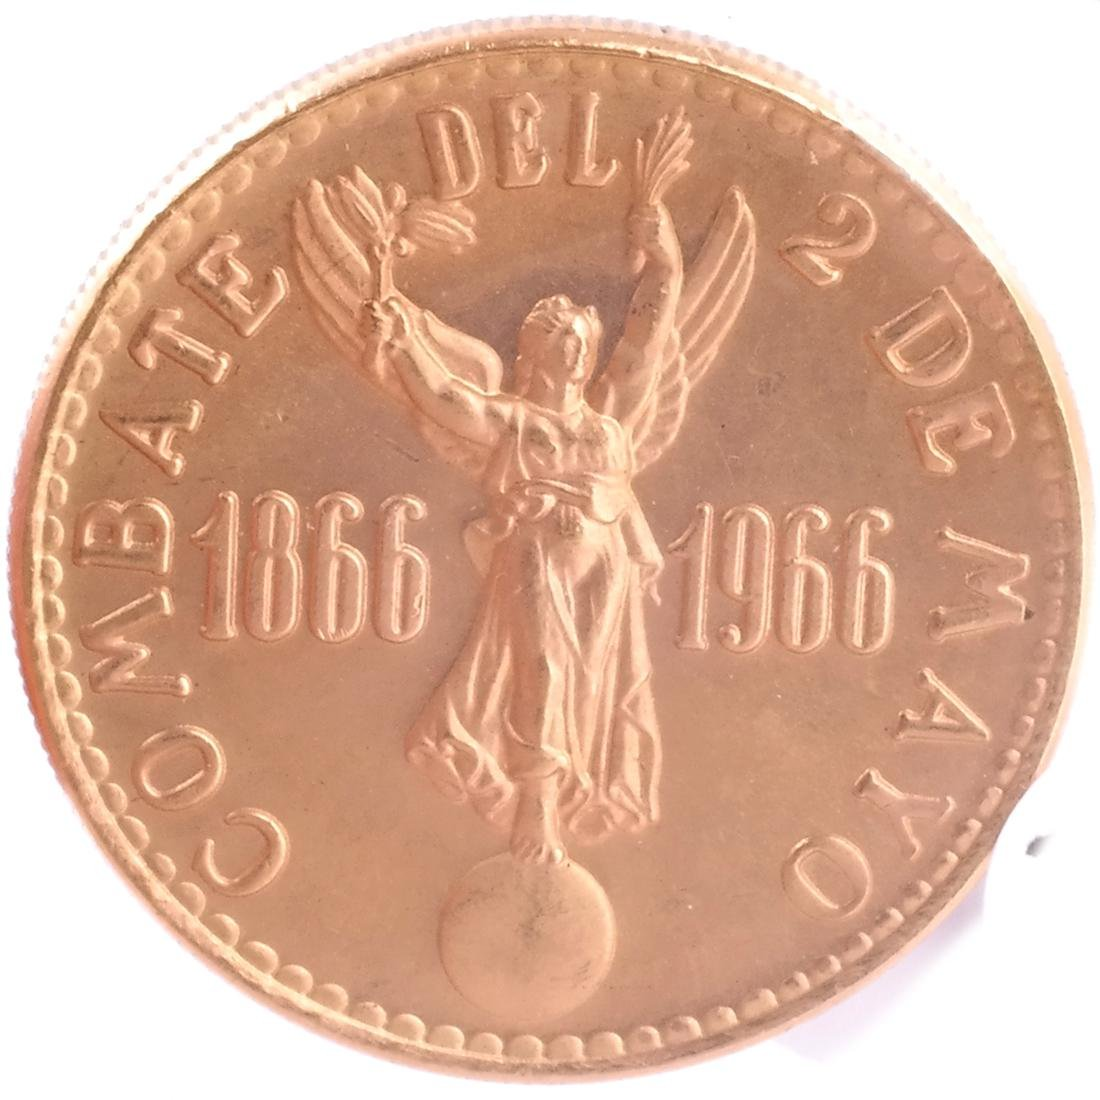 1966 Peru Gold, Anniversary of Battle - 2